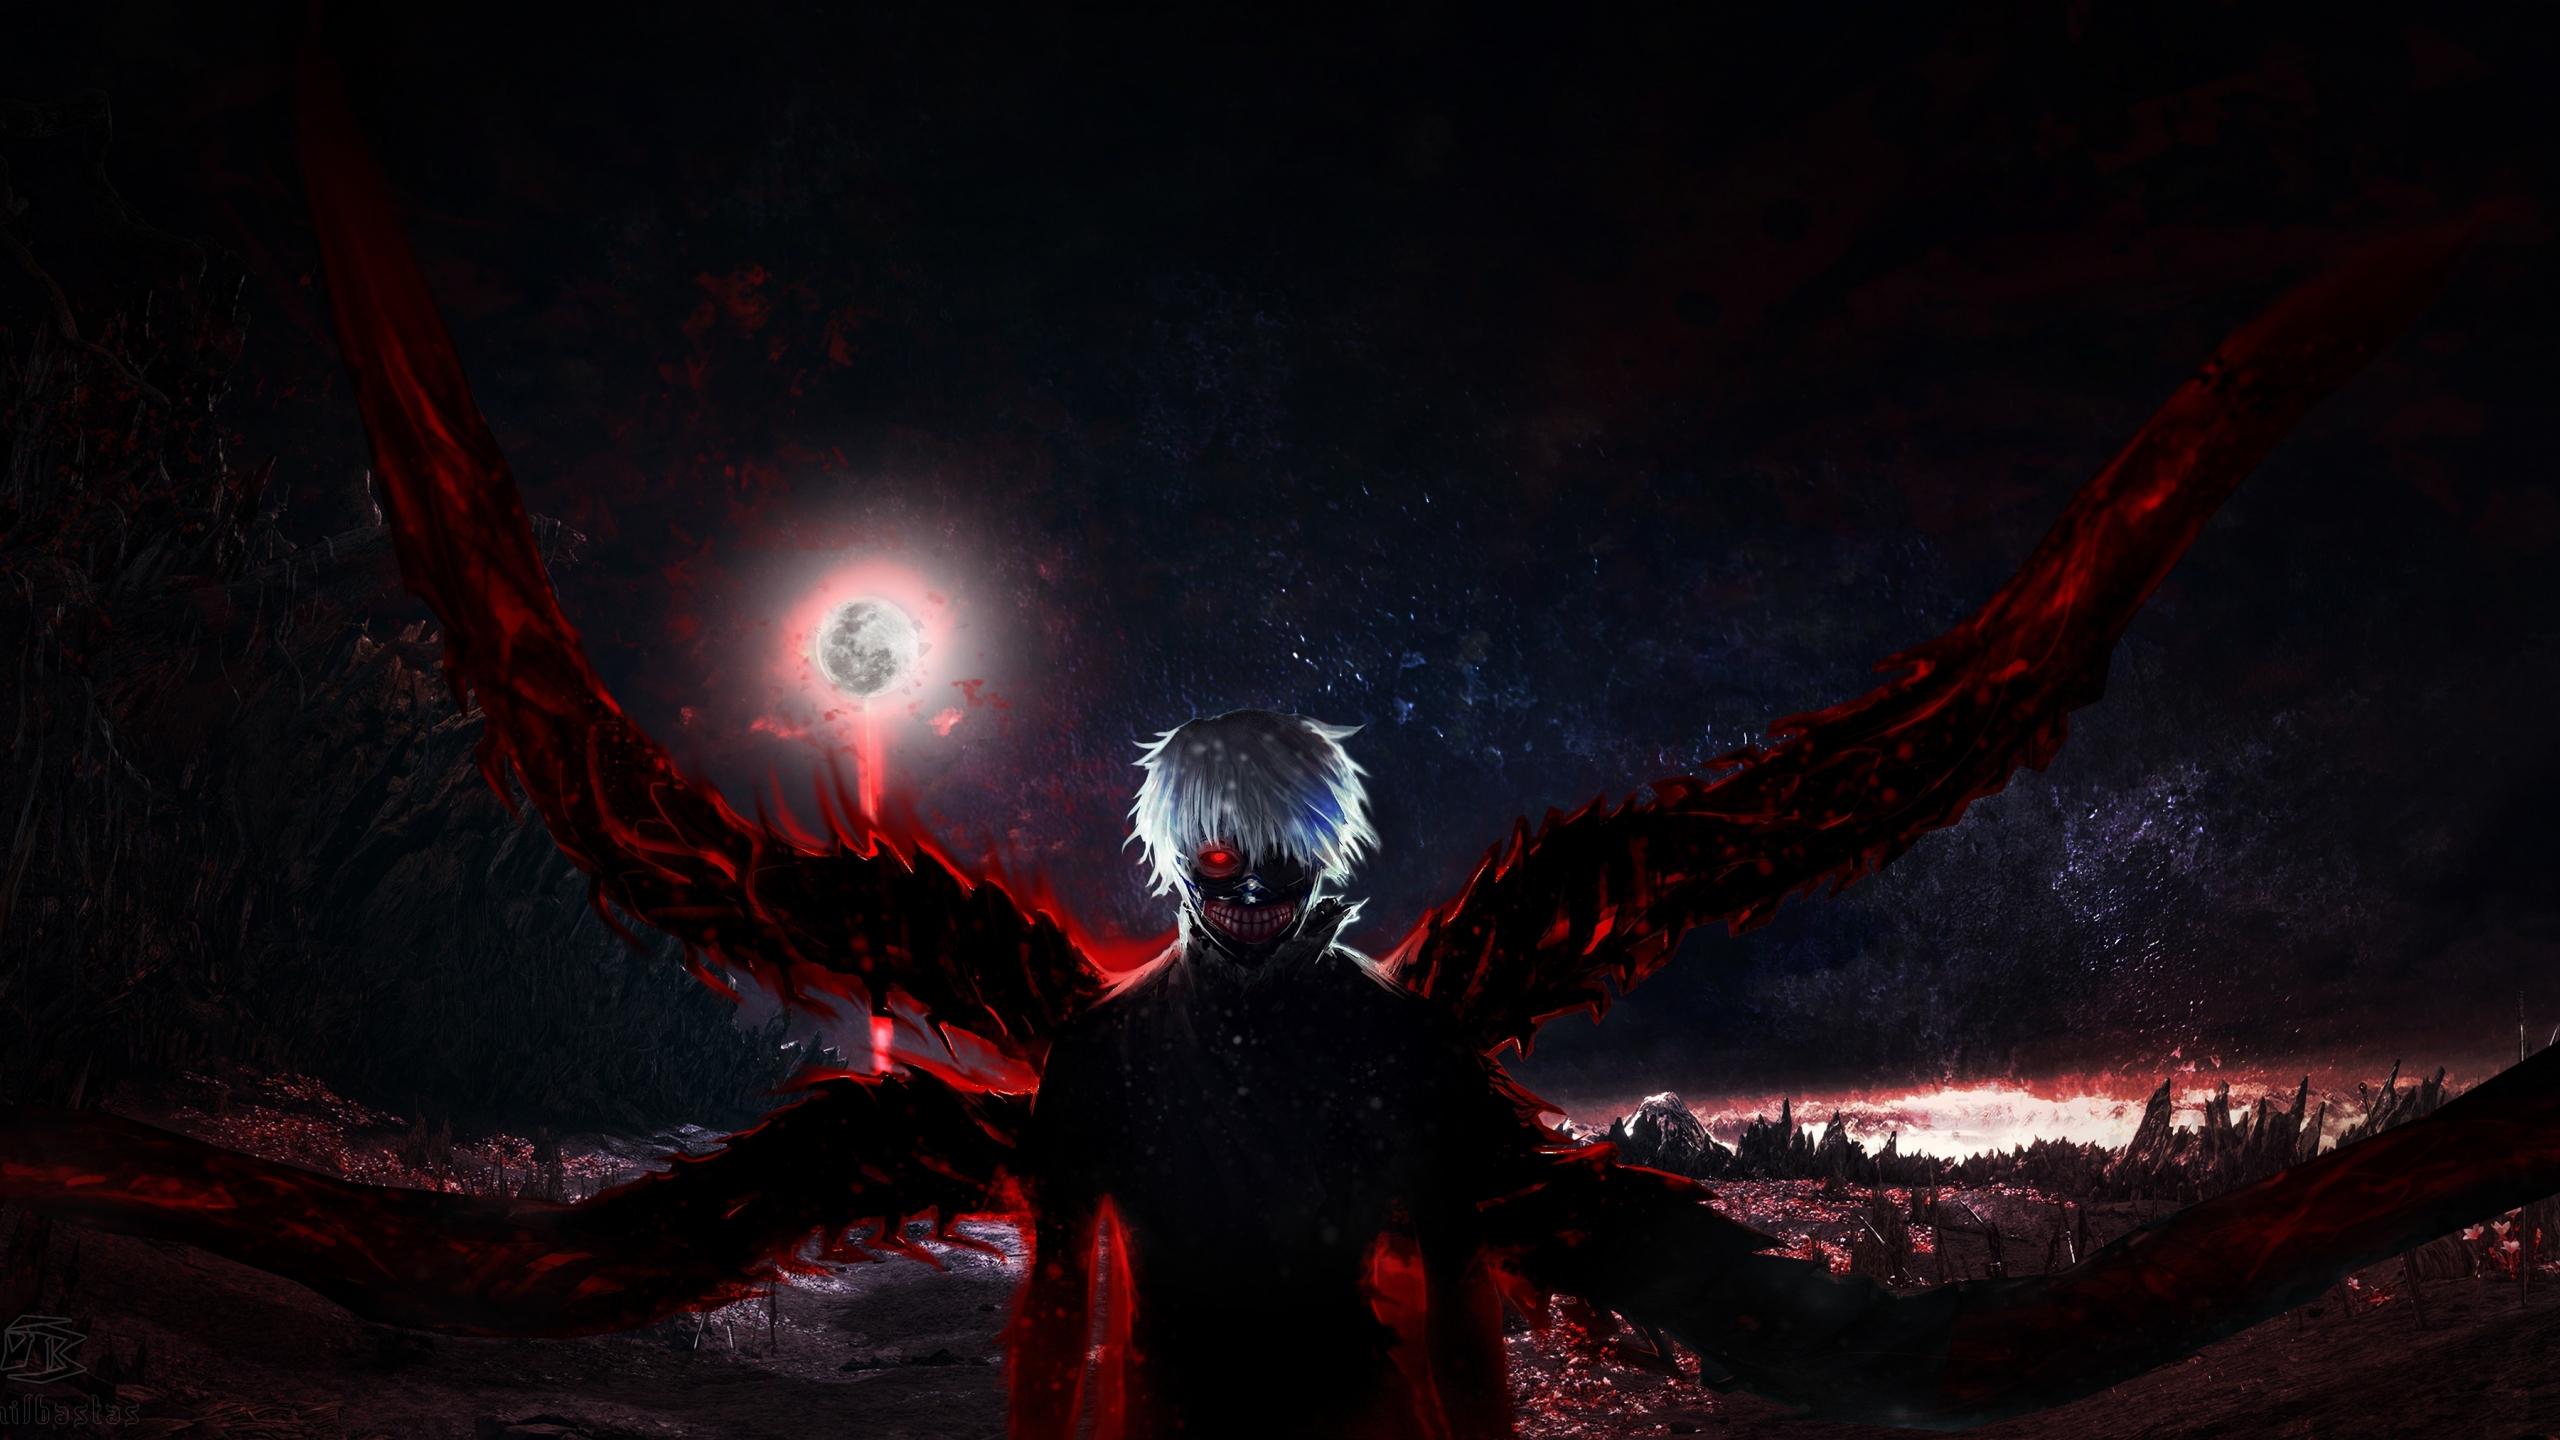 Download 2560x1440 Wallpaper Tokyo Ghoul Dark Anime Boy Artwork Dual Wide Widescreen 16 9 Widescreen 2560x1440 Hd Image Background 18584